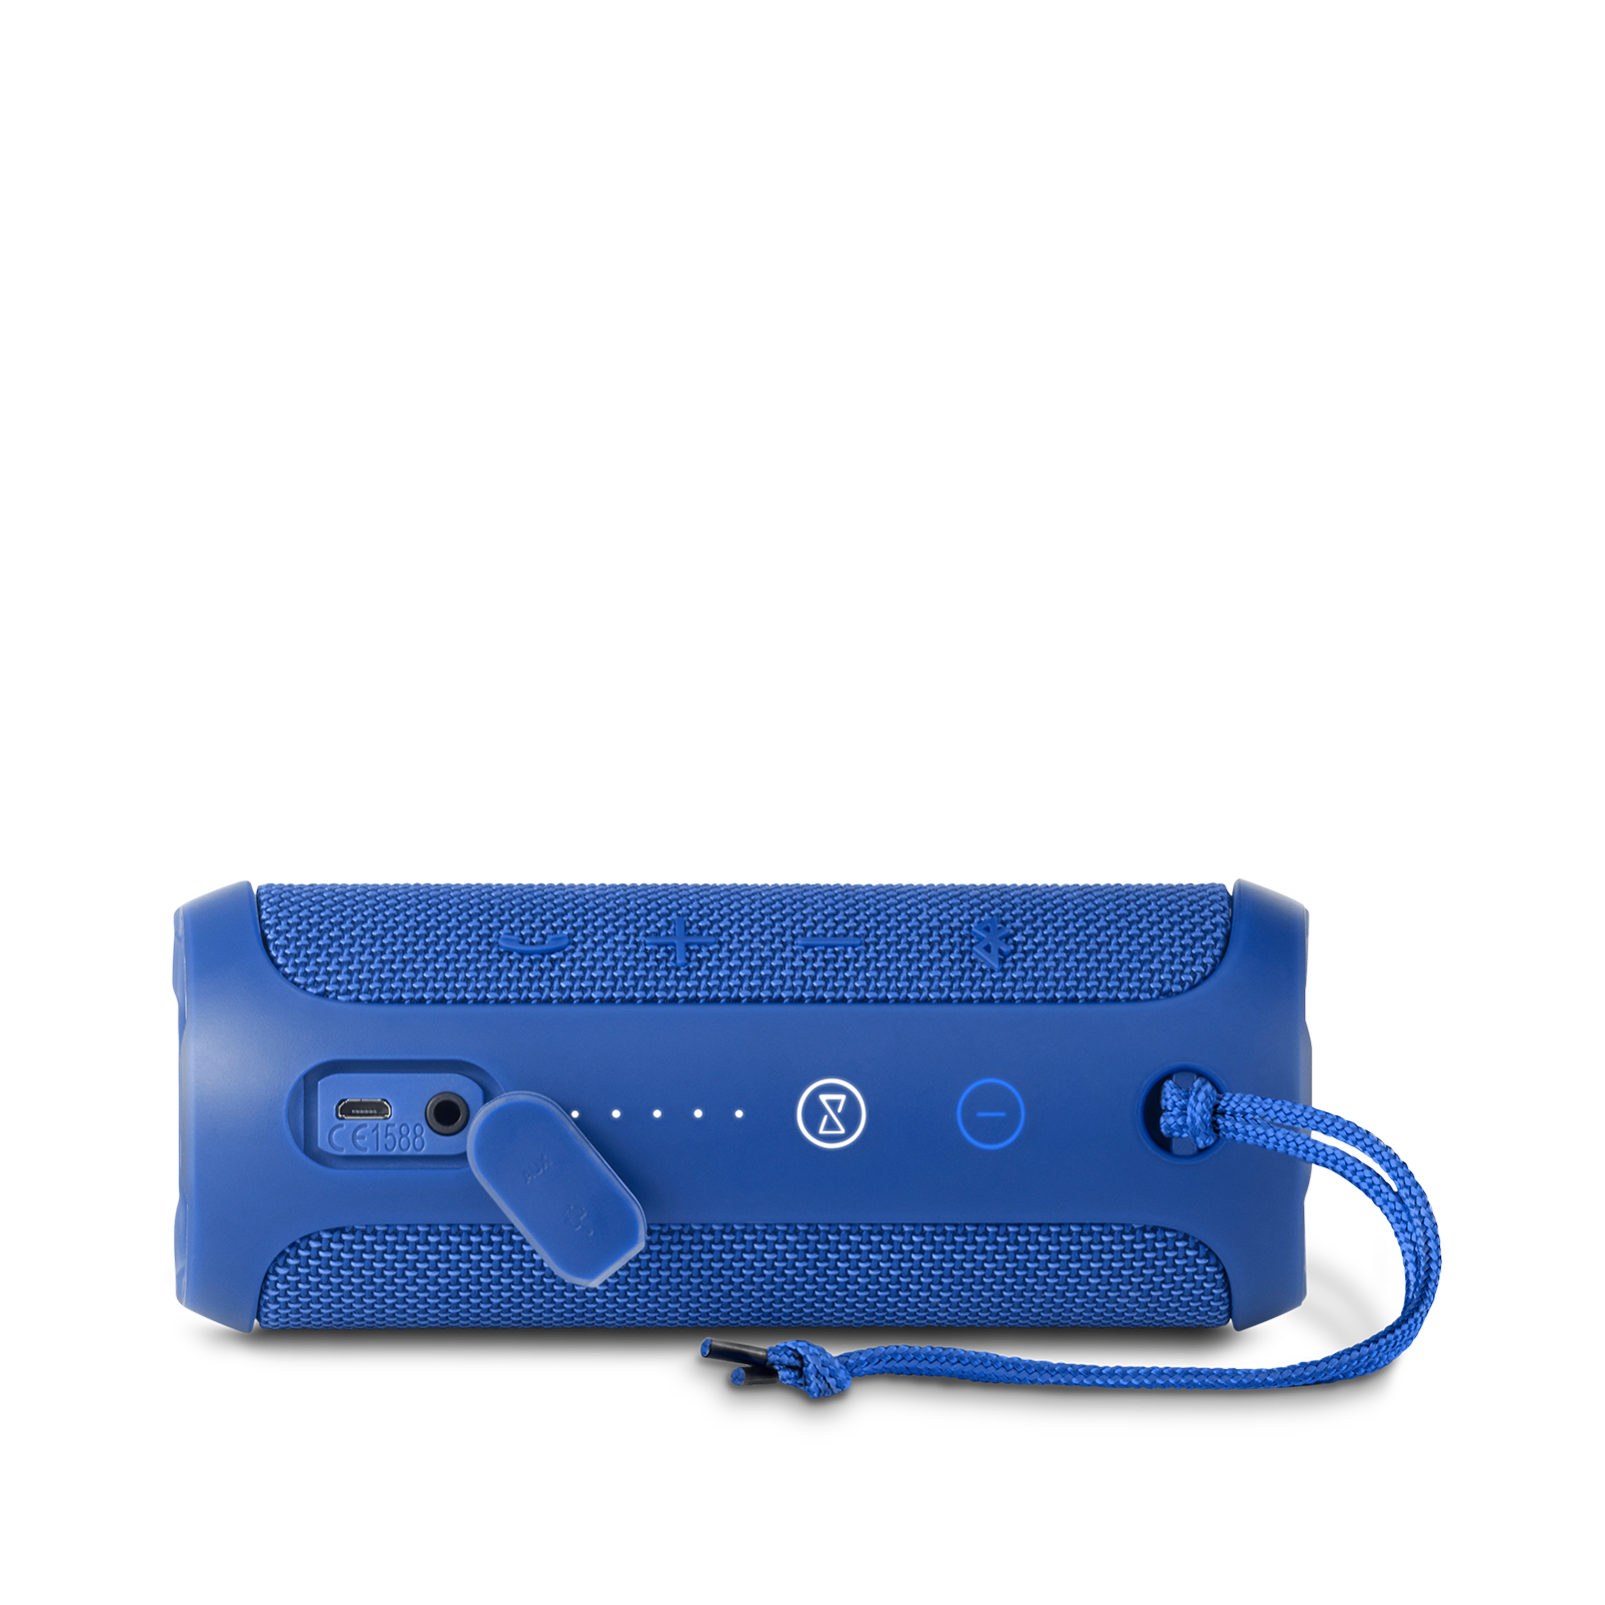 JBL Flip 3 - Blue - Splashproof portable Bluetooth speaker with powerful sound and speakerphone technology - Detailshot 3